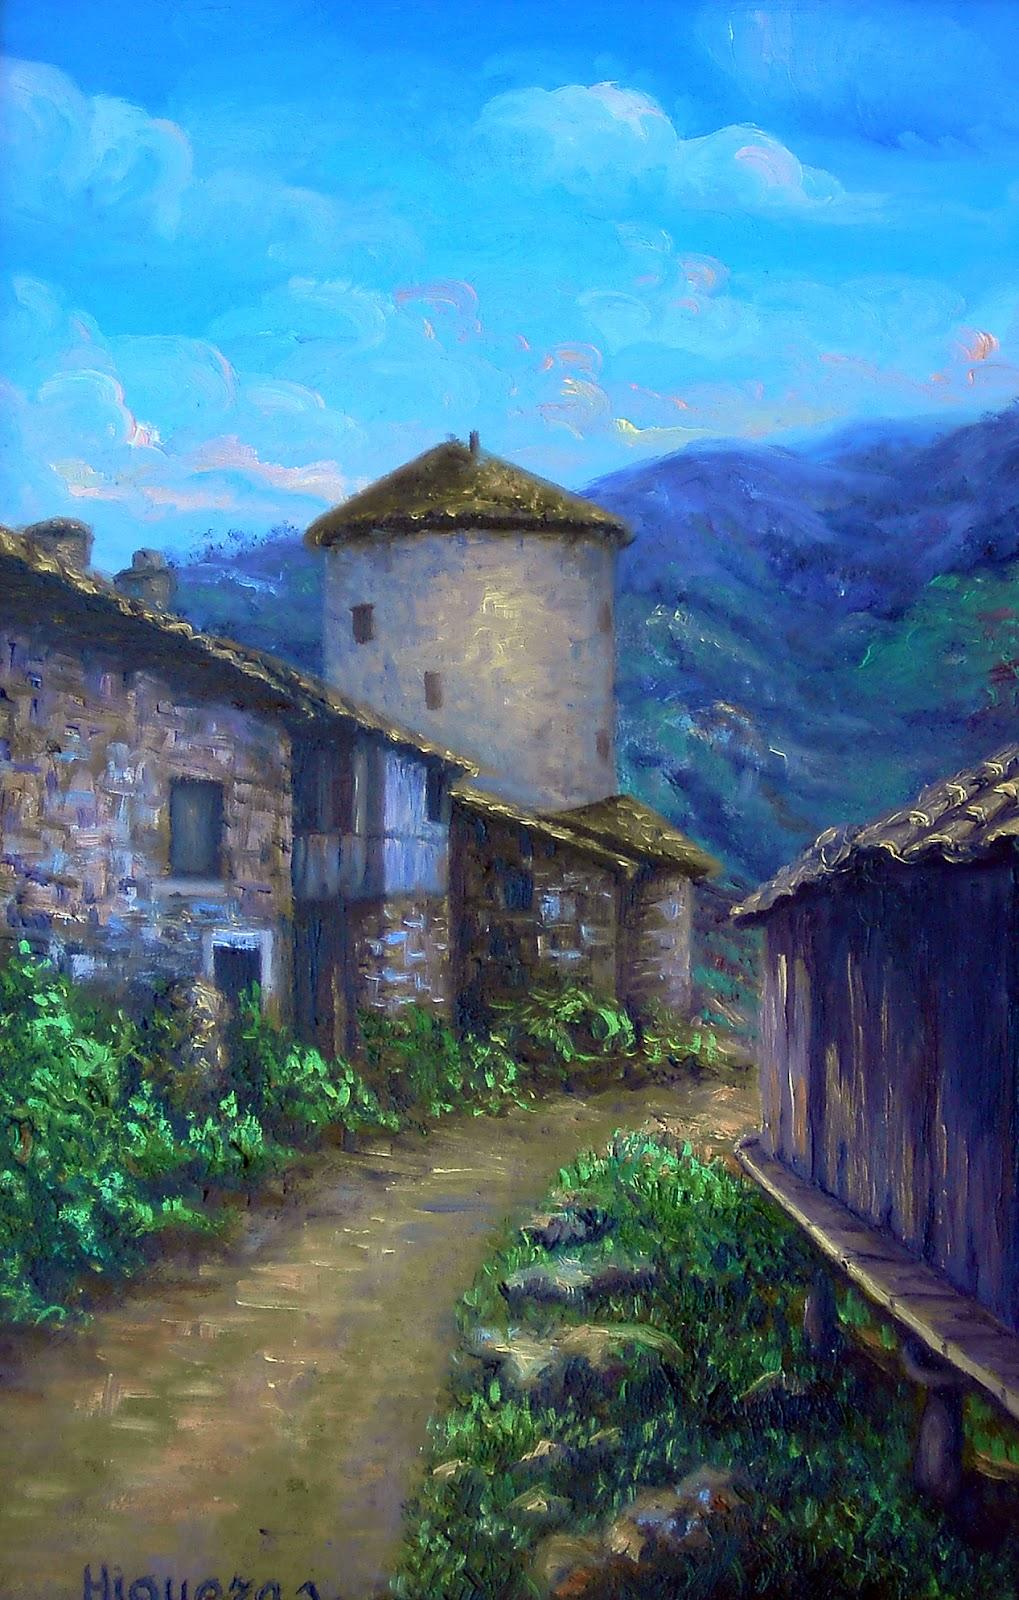 Pintores sin fronteras bandujo asturias - Pintores en asturias ...